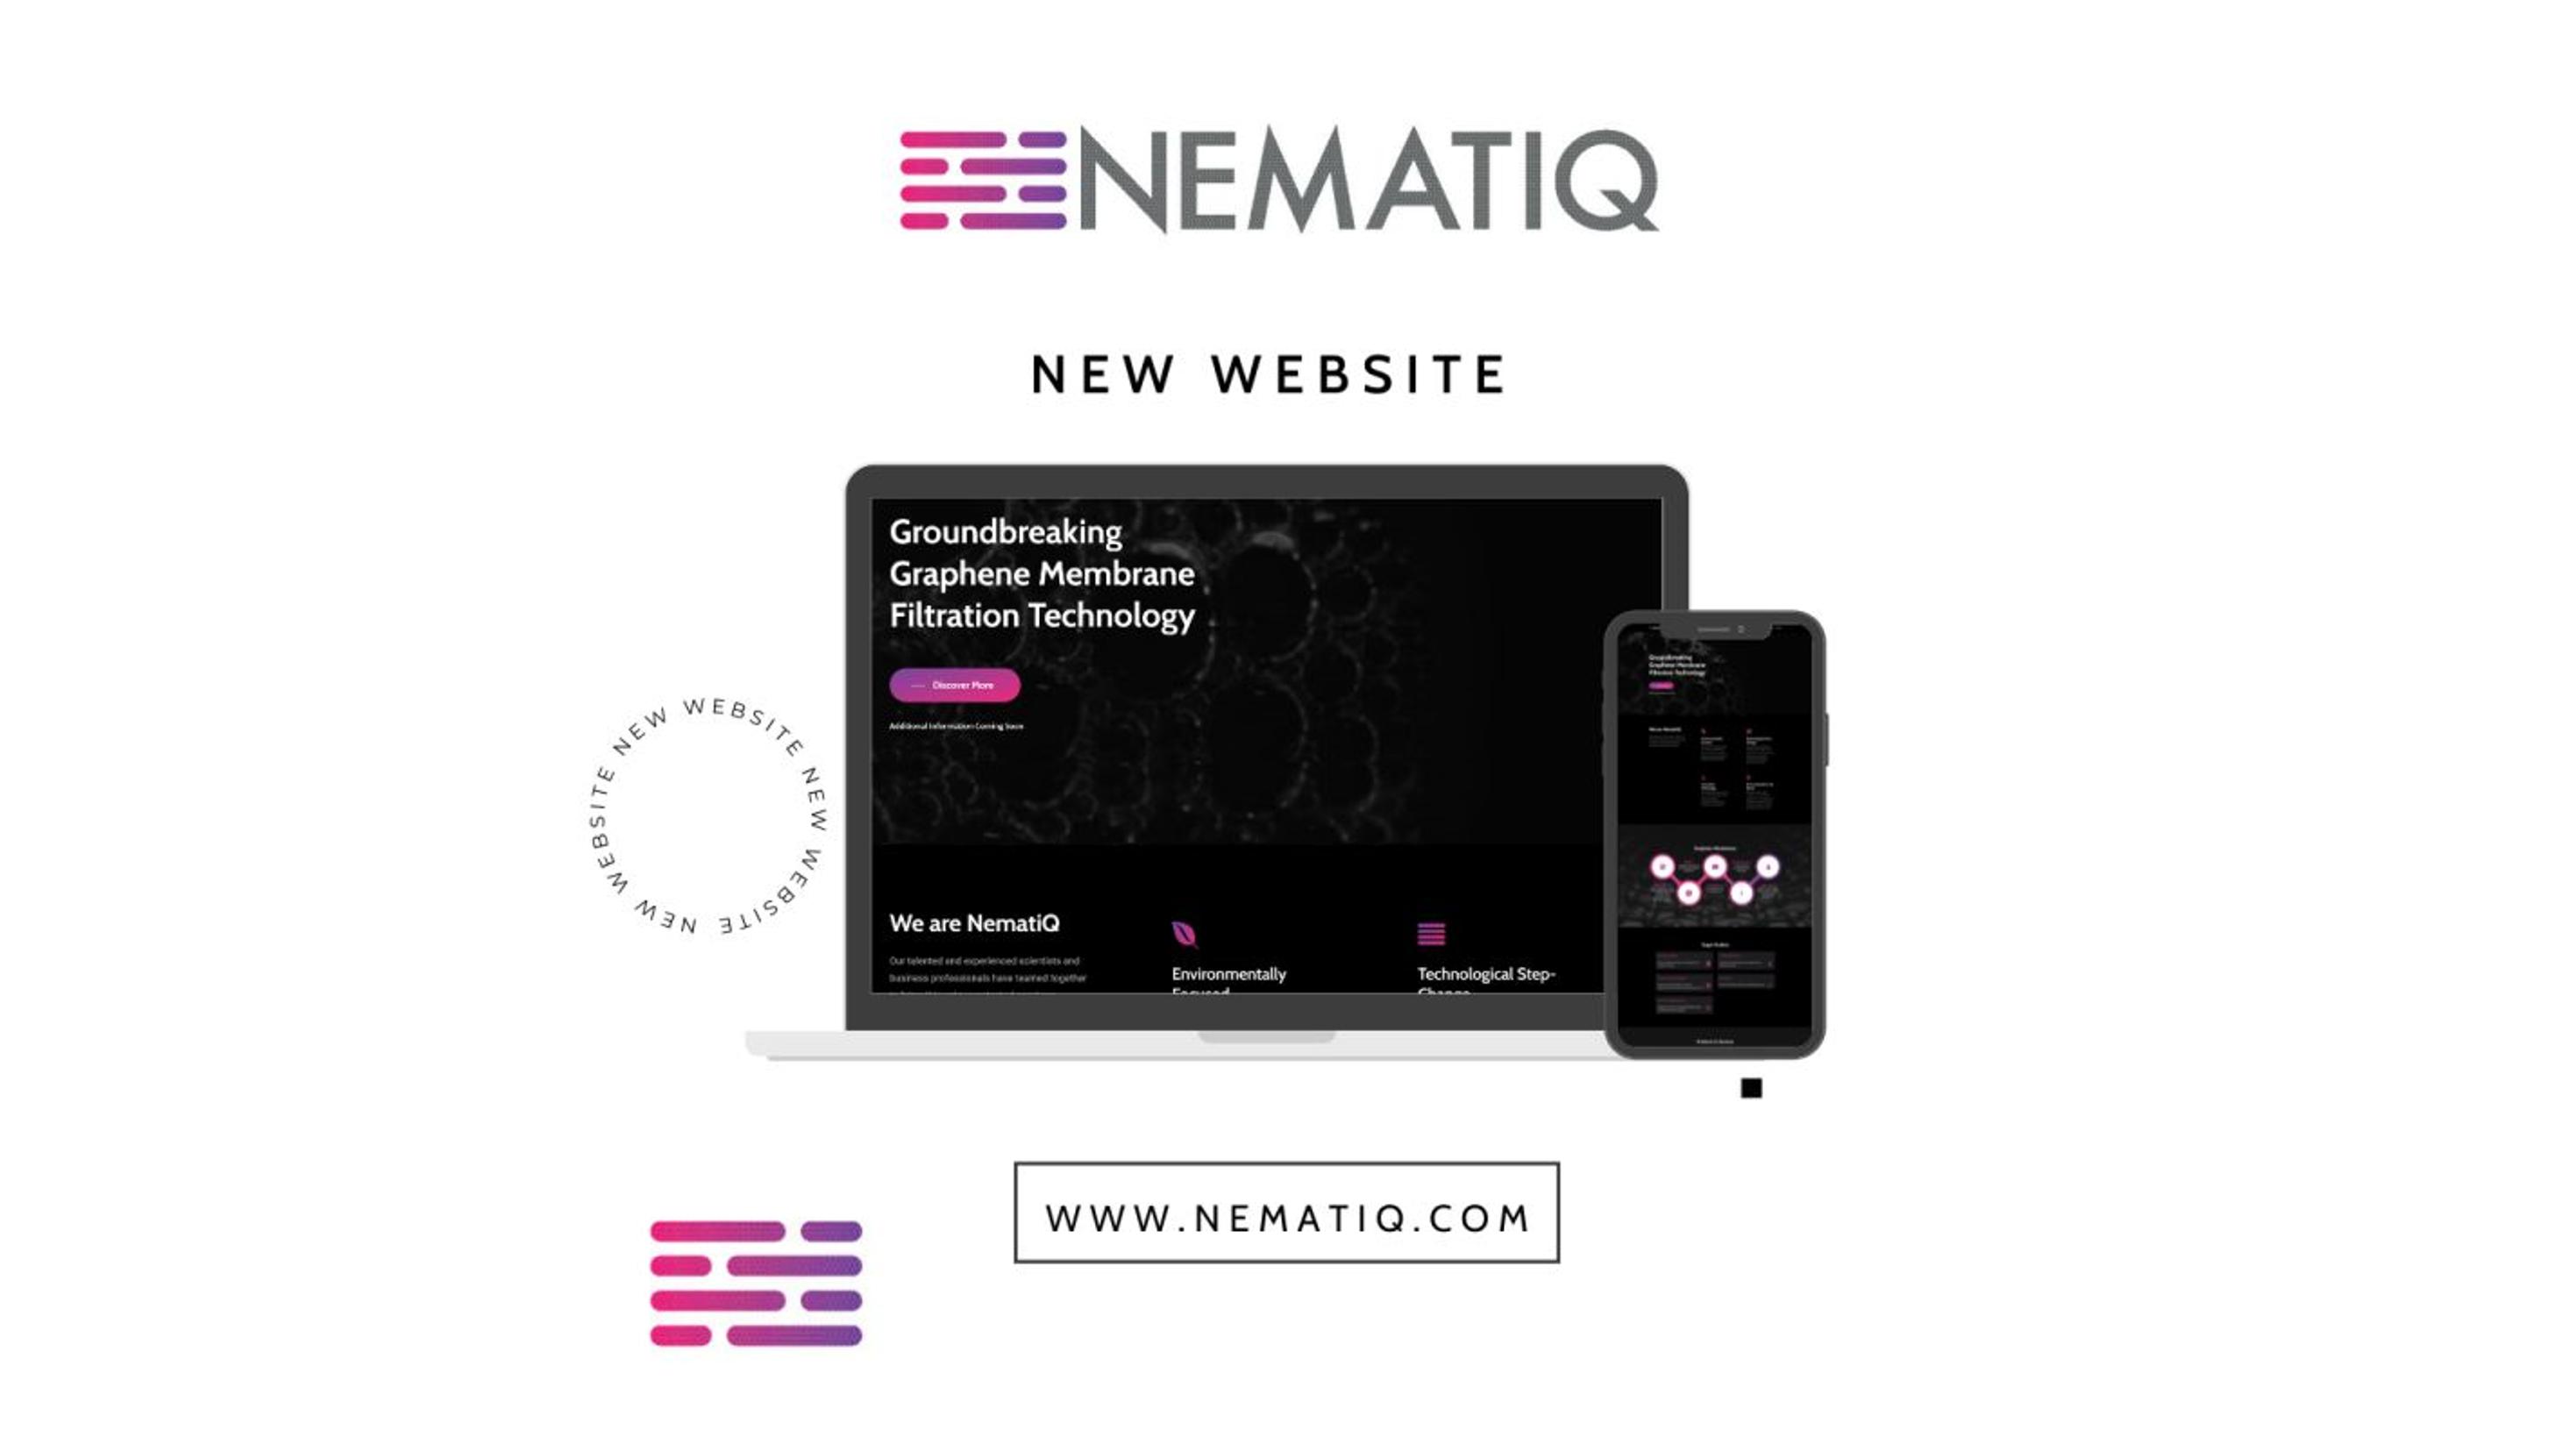 NematiQ Website Launched